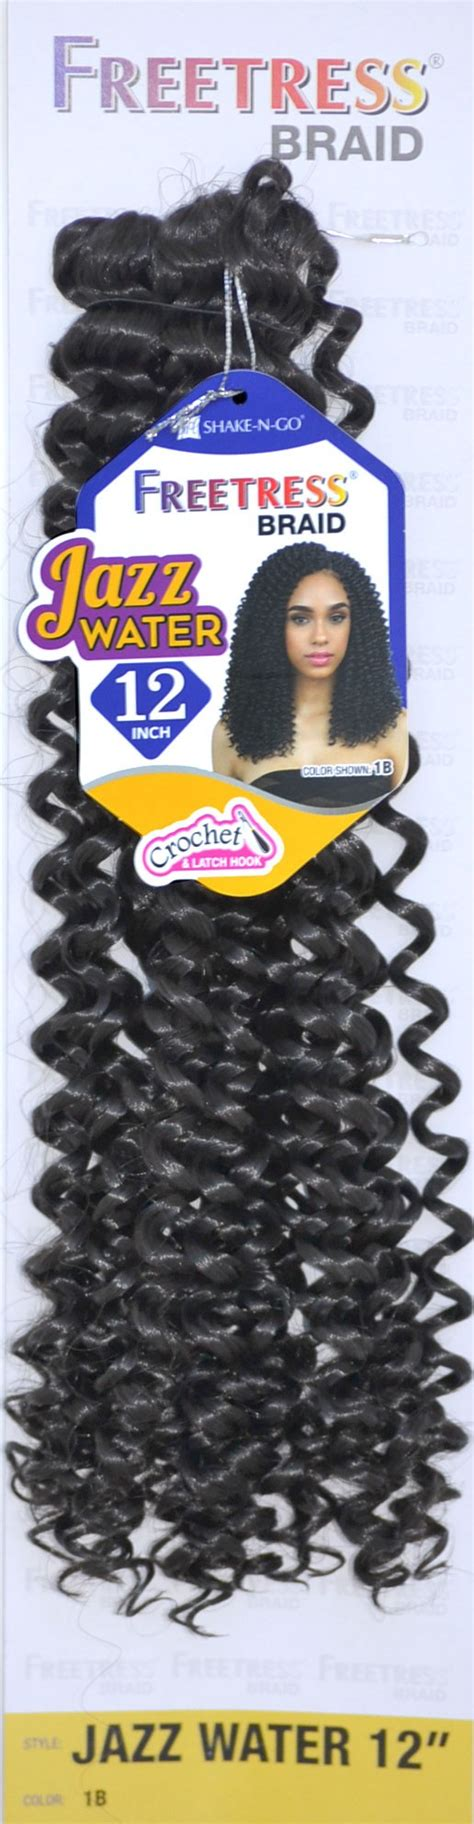 freetress braid crochet braid jazz water